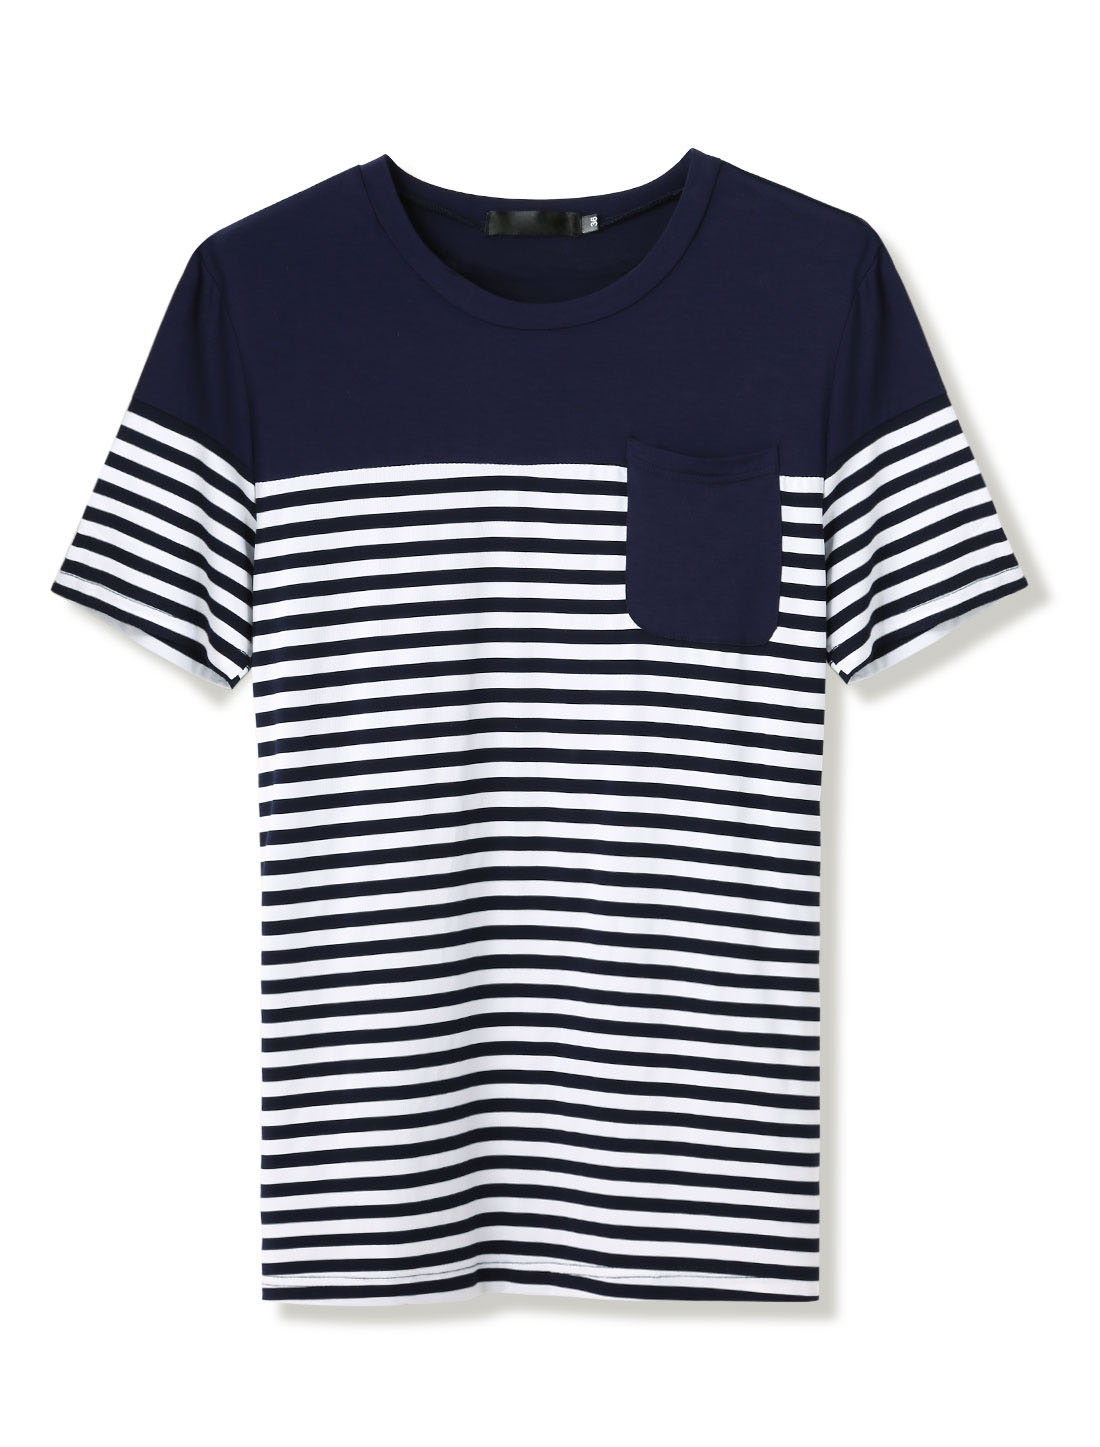 Men Short Sleeve Pocket Slim Fit Casual Stripes T Shirt Navy Blue L